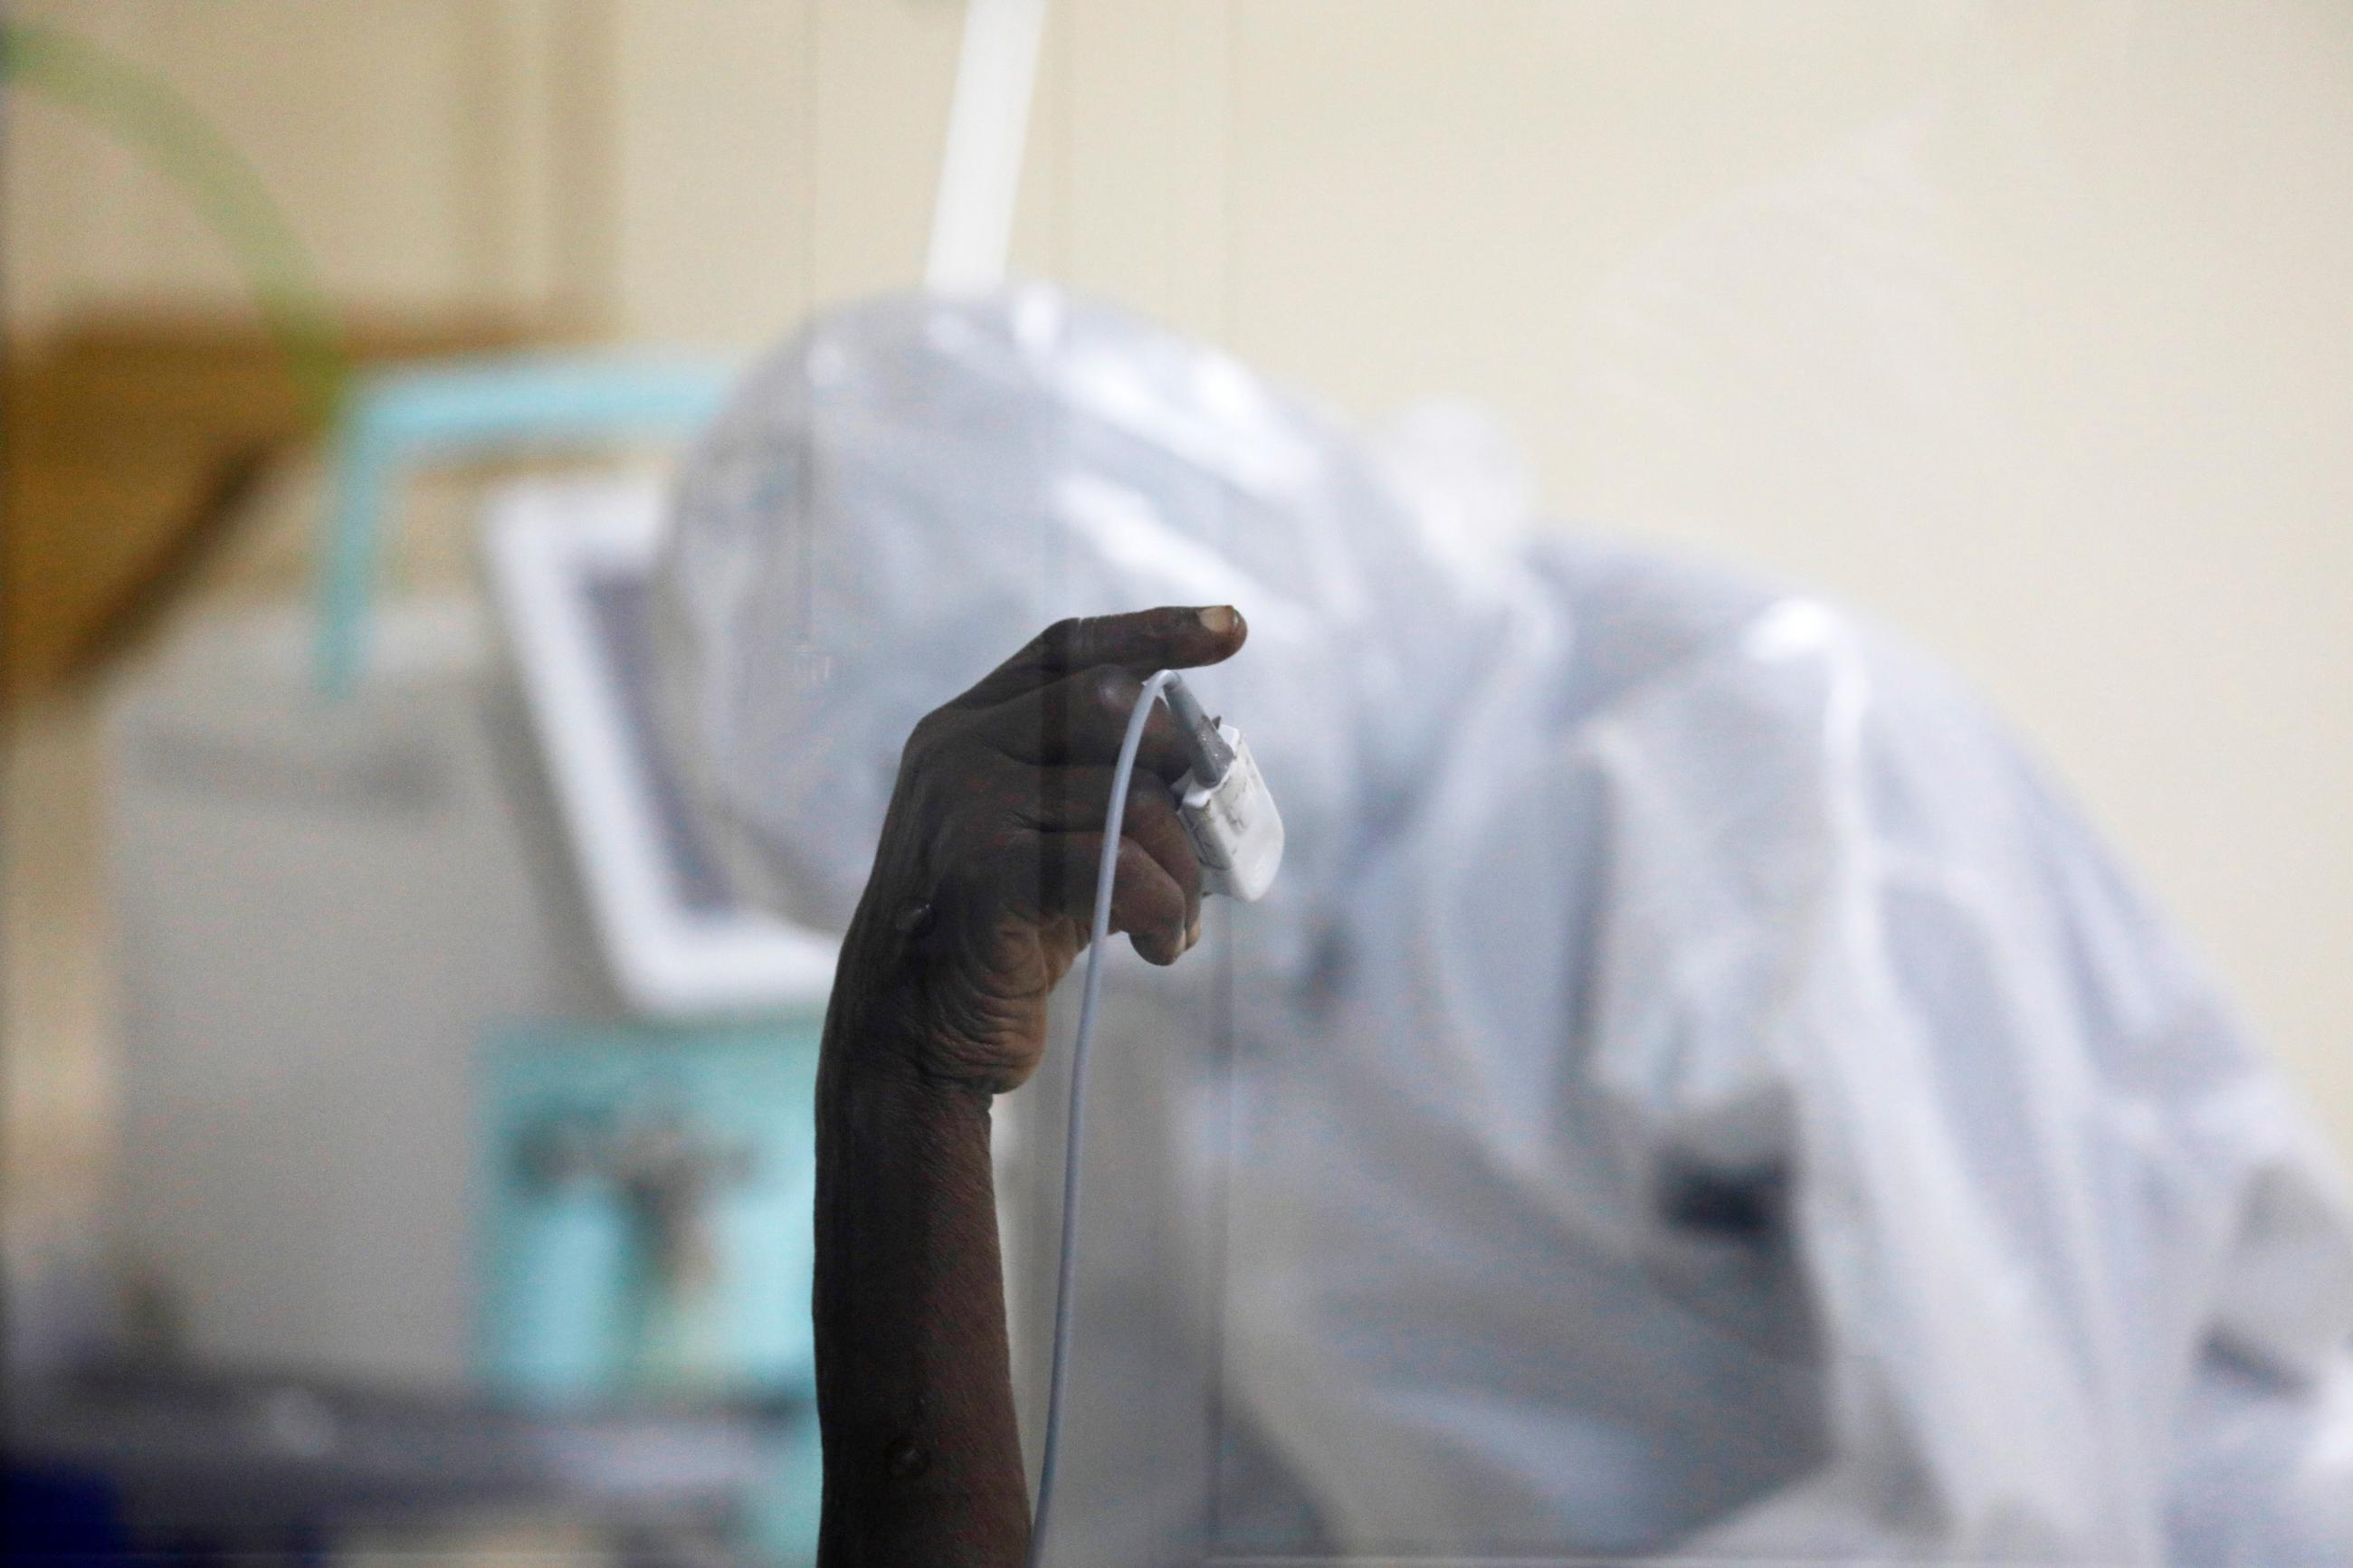 A coronavirus disease patient holds up his hand inside the COVID-19 ICU of Machakos Level 5 Hospital, in Machakos, Kenya October 28, 2020.